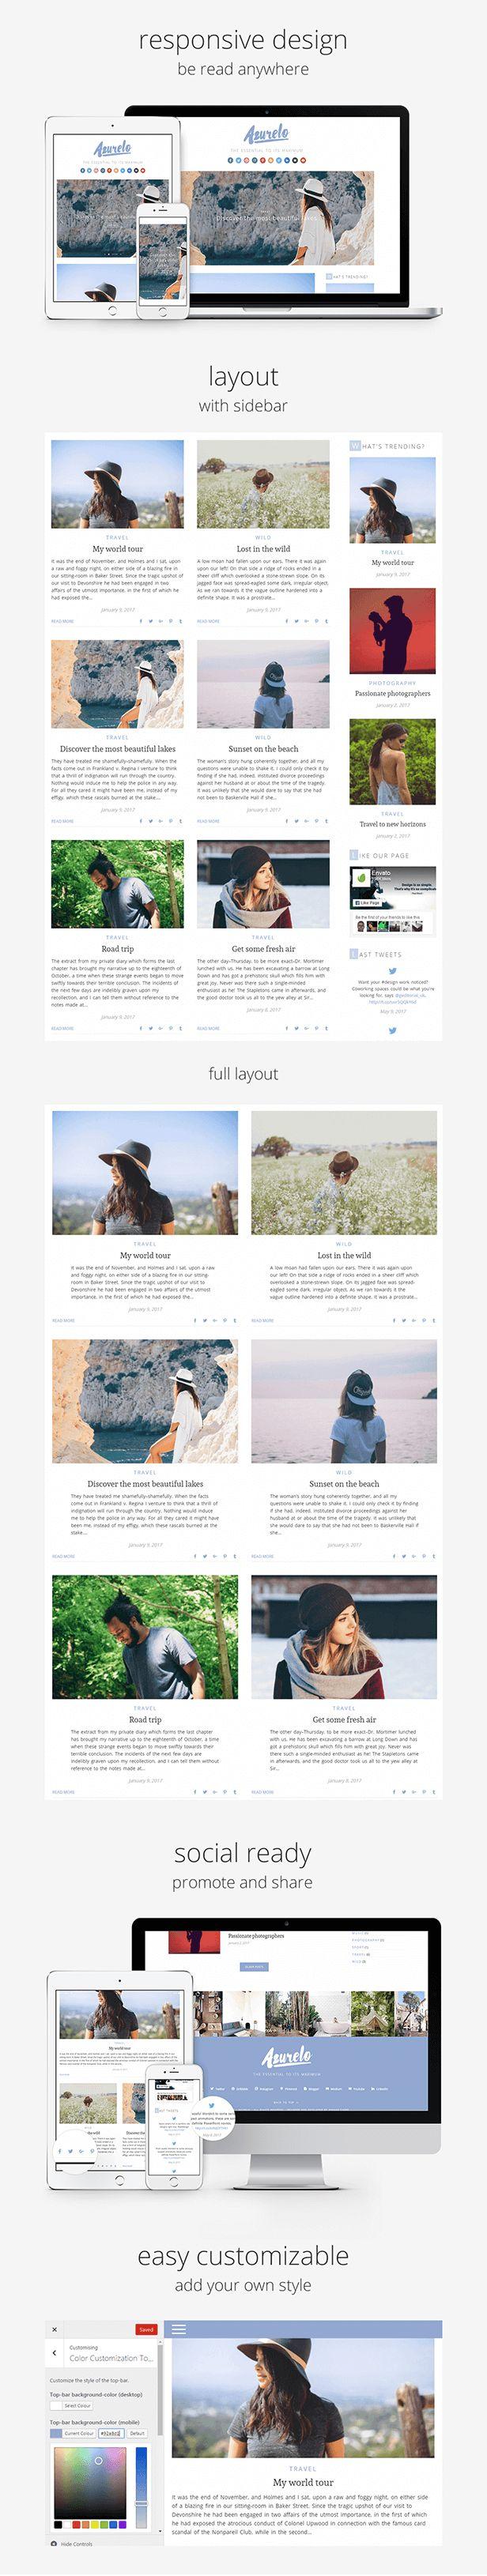 Ad: Azurelo, an Essential Blog Theme for WordPress by anakao-theme | ThemeForest 44$